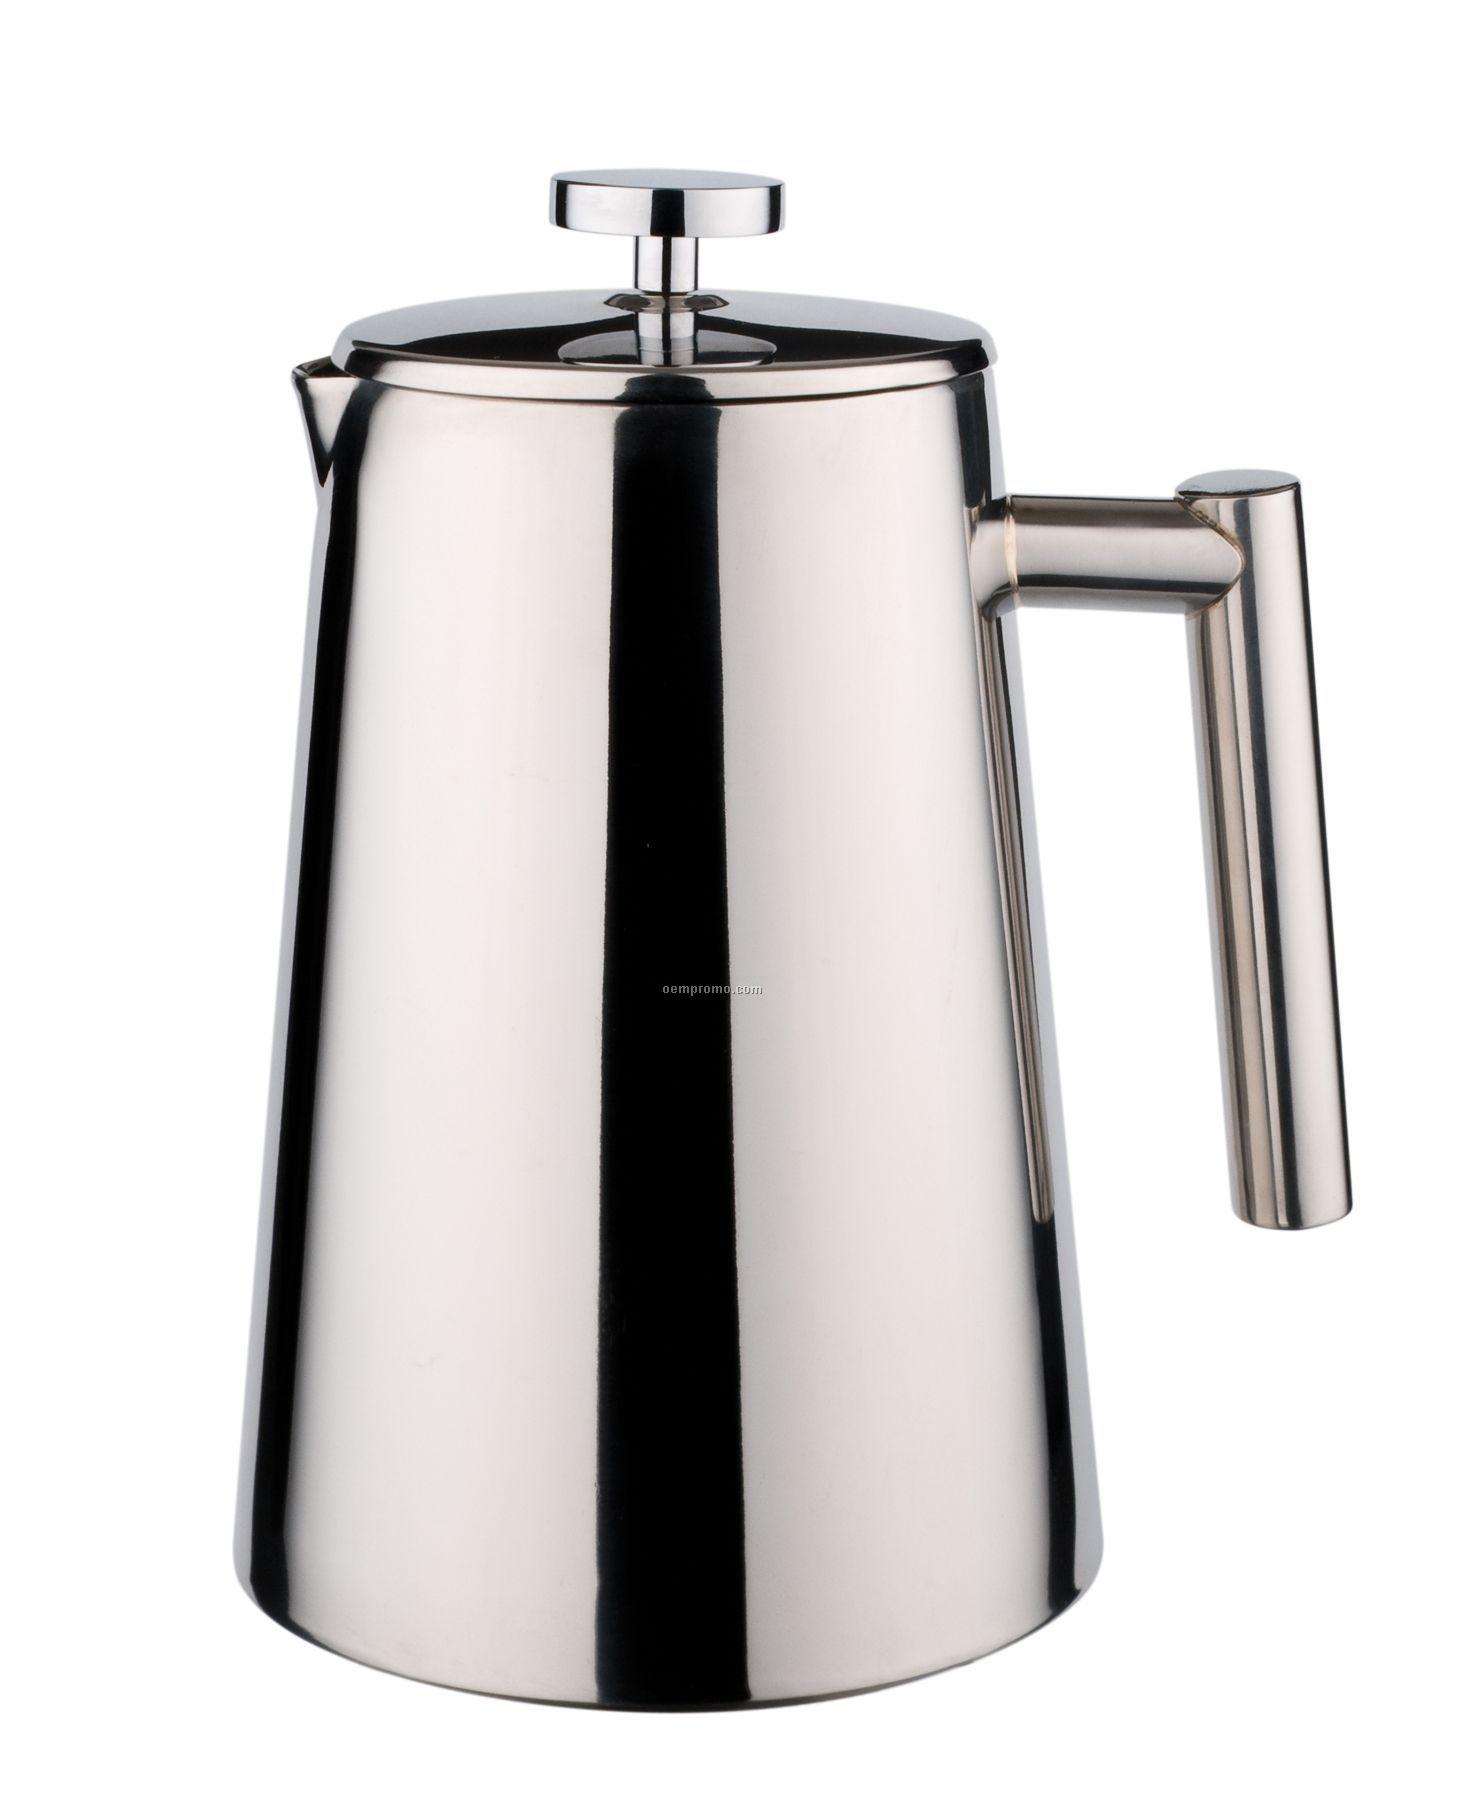 1 Liter Stainless Steel Coffee Press